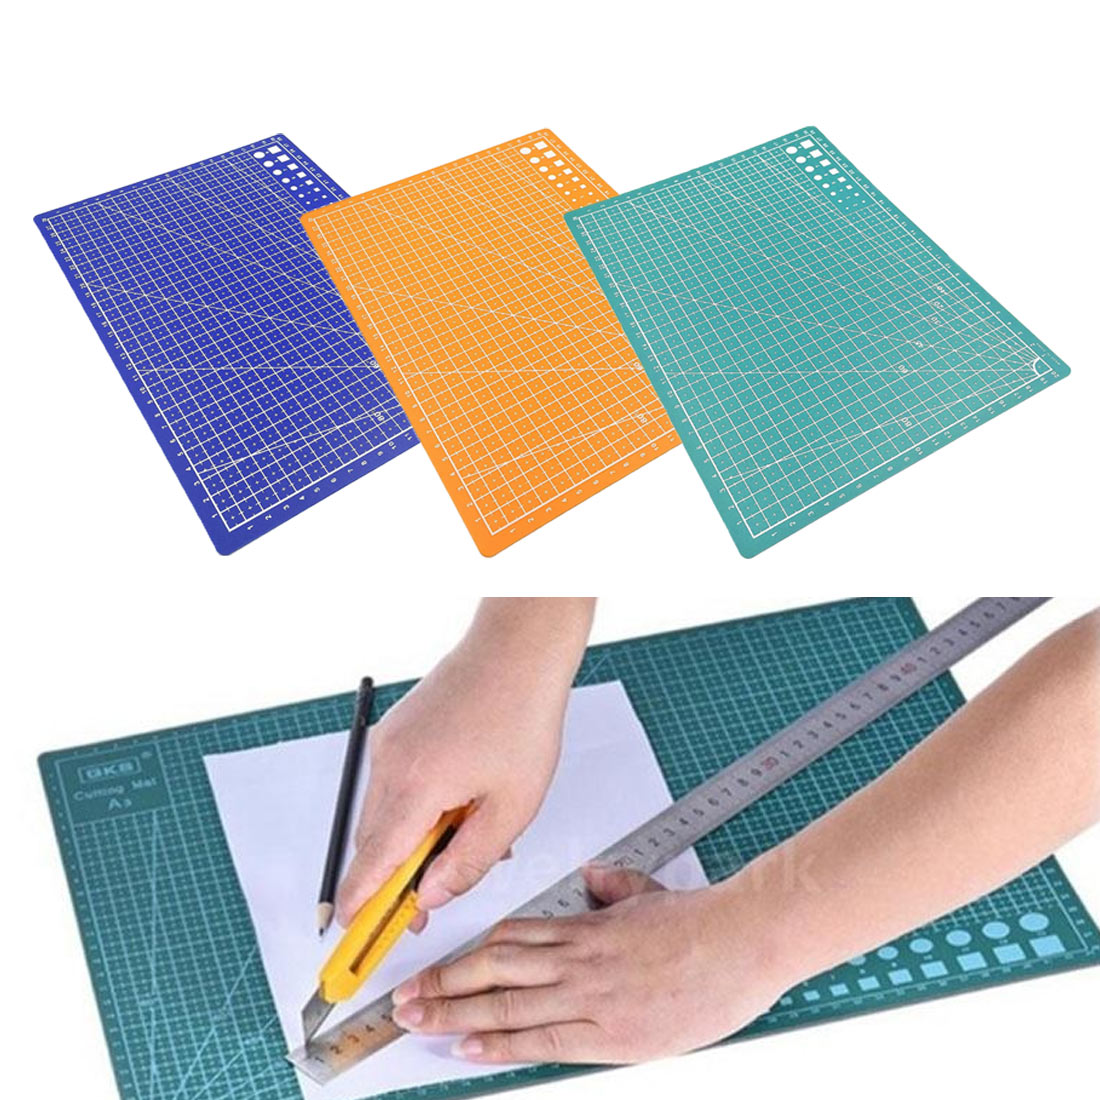 PP Cutting Mat Pad A4 grid line self-healing cutting pad craft card cloth leather cardboard sewing tool Patchwork Cut Pad